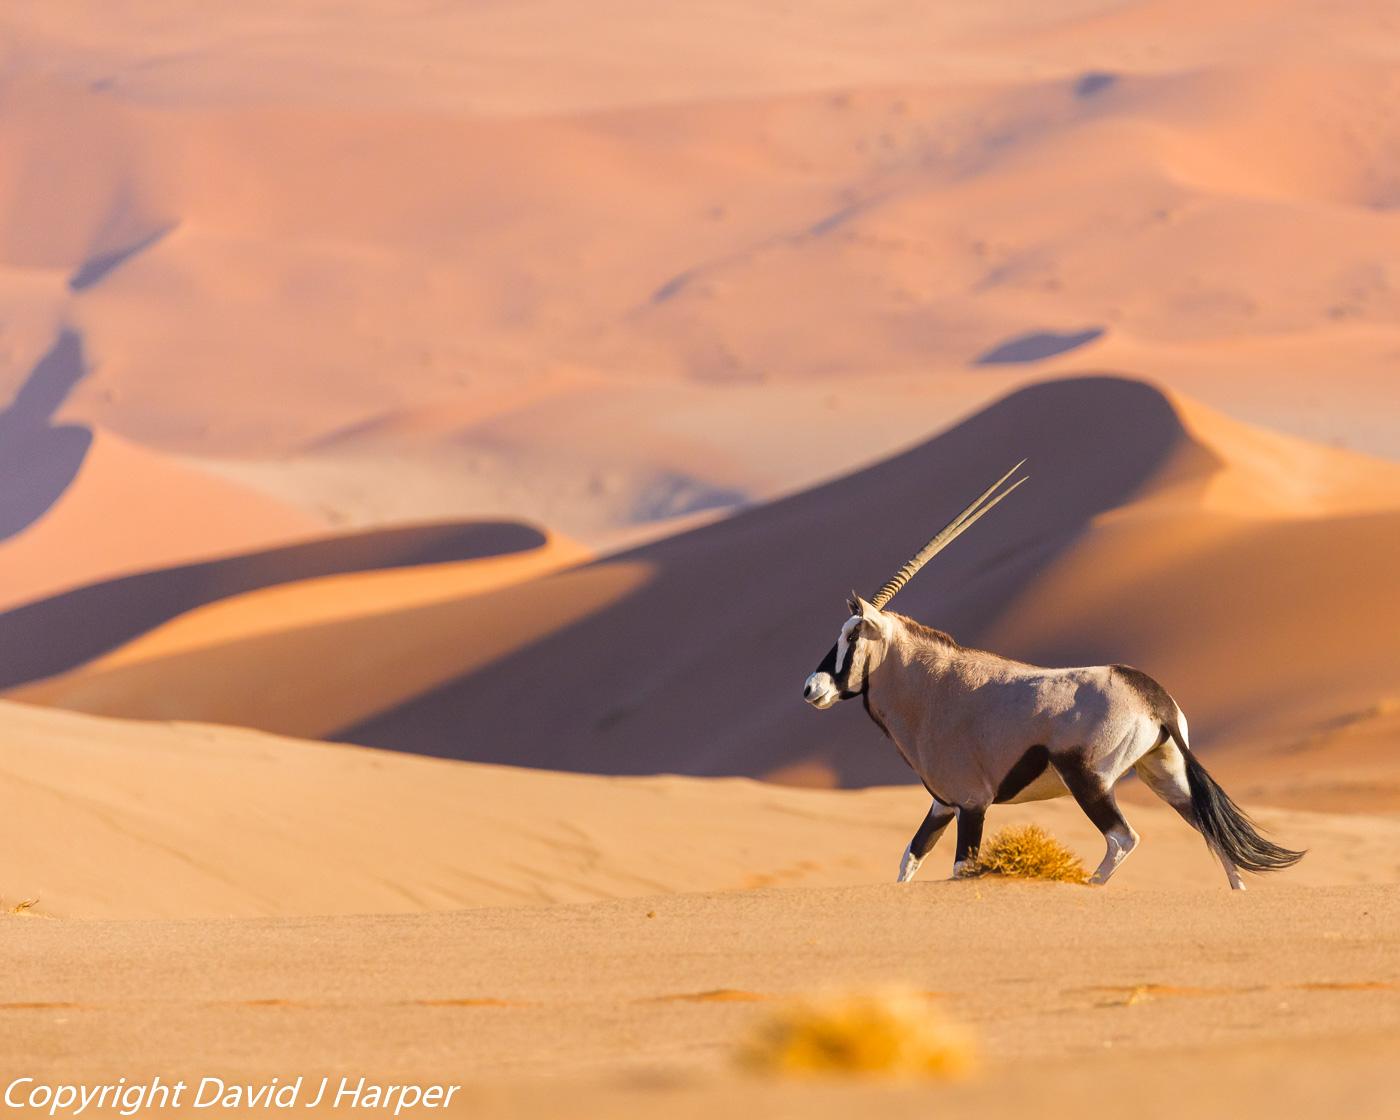 DJH-Namibia-20171026-0P0A6927